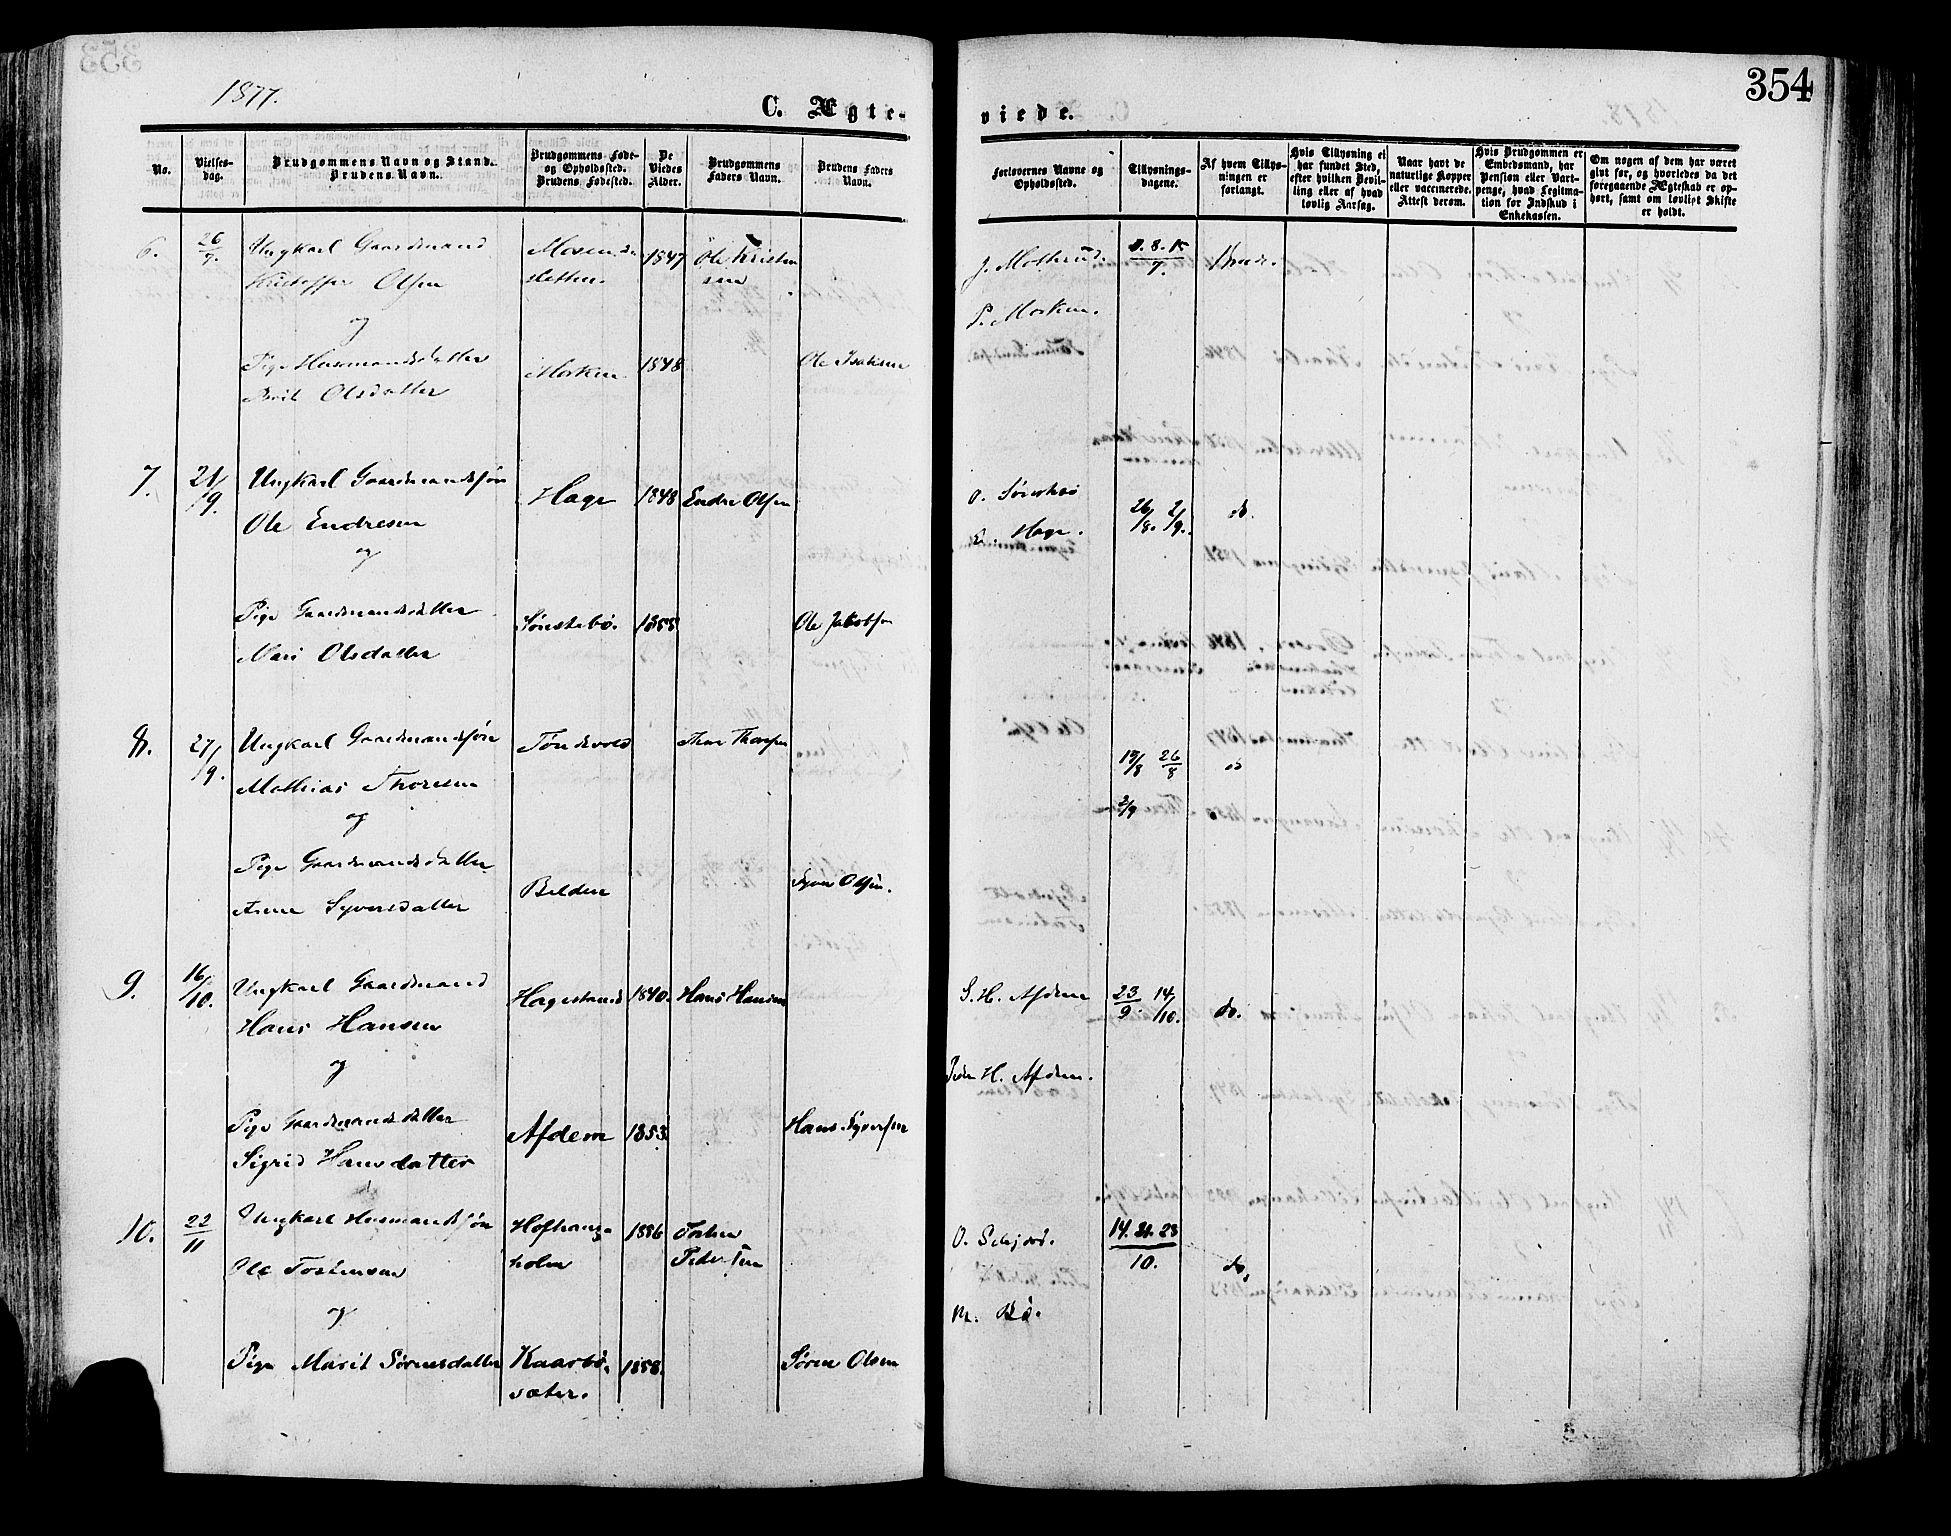 SAH, Lesja prestekontor, Ministerialbok nr. 8, 1854-1880, s. 354